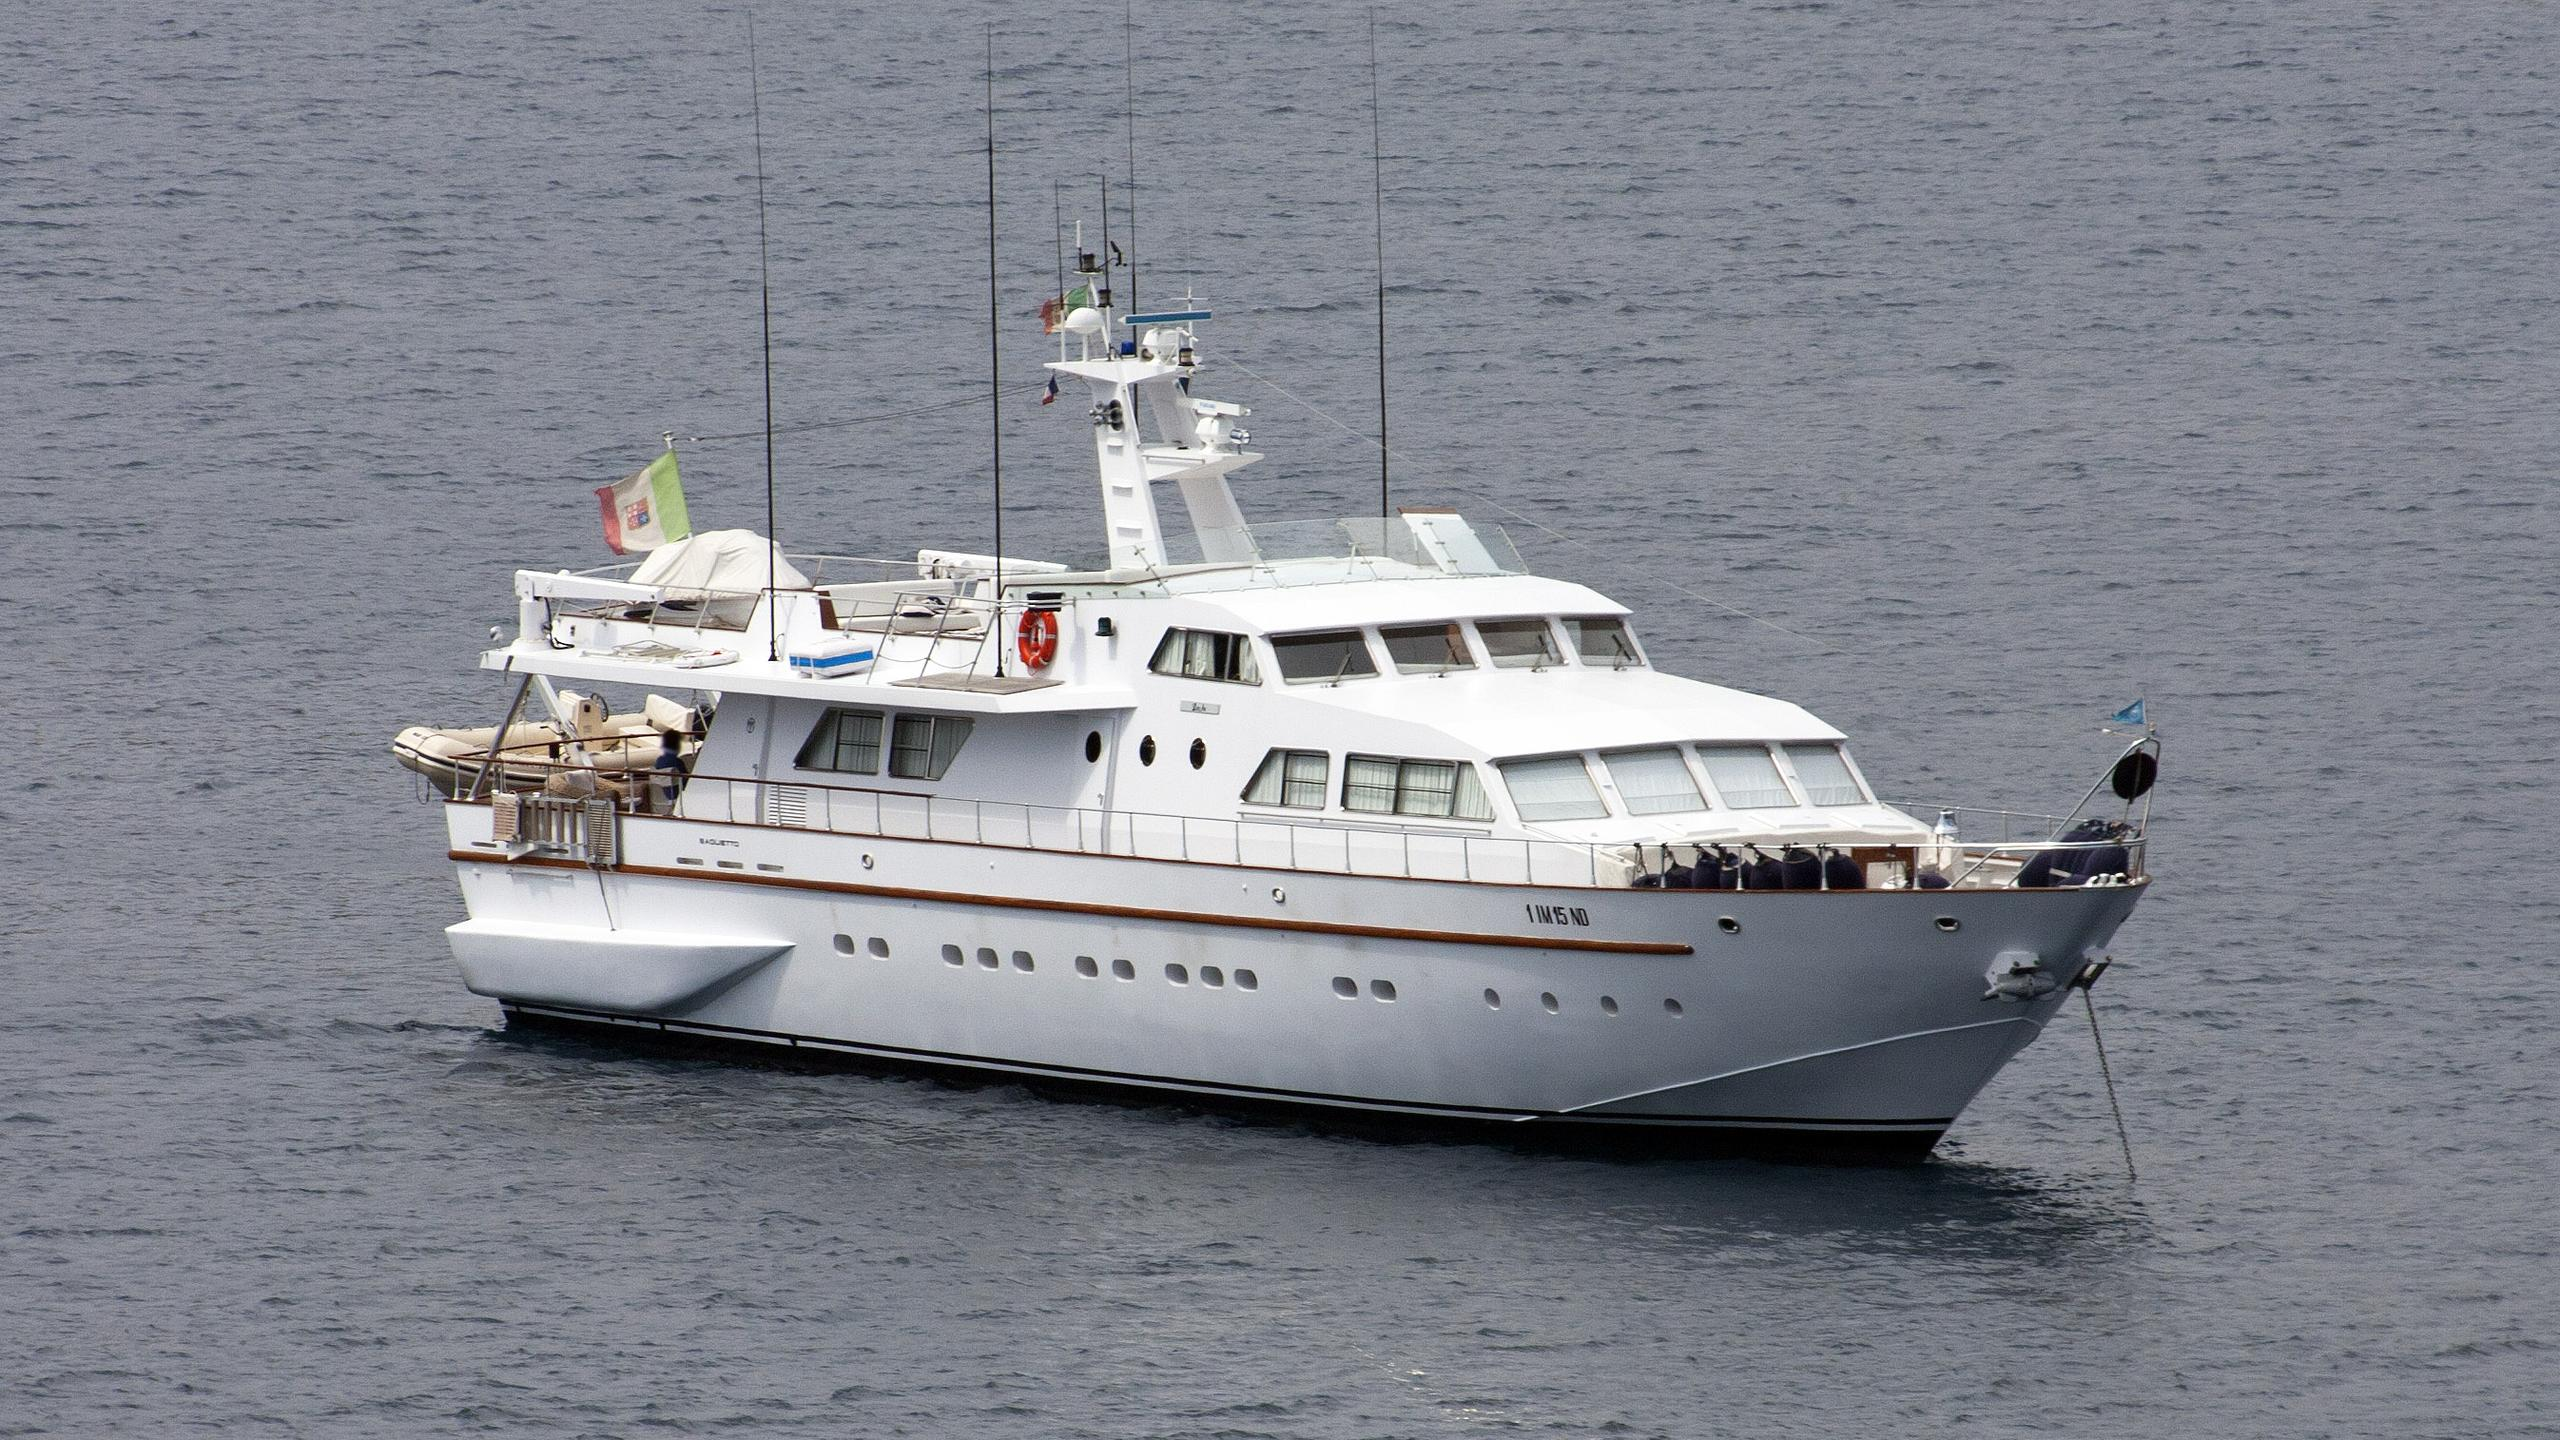 luc-an-motor-yacht-baglietto-1989-31m-half-profile